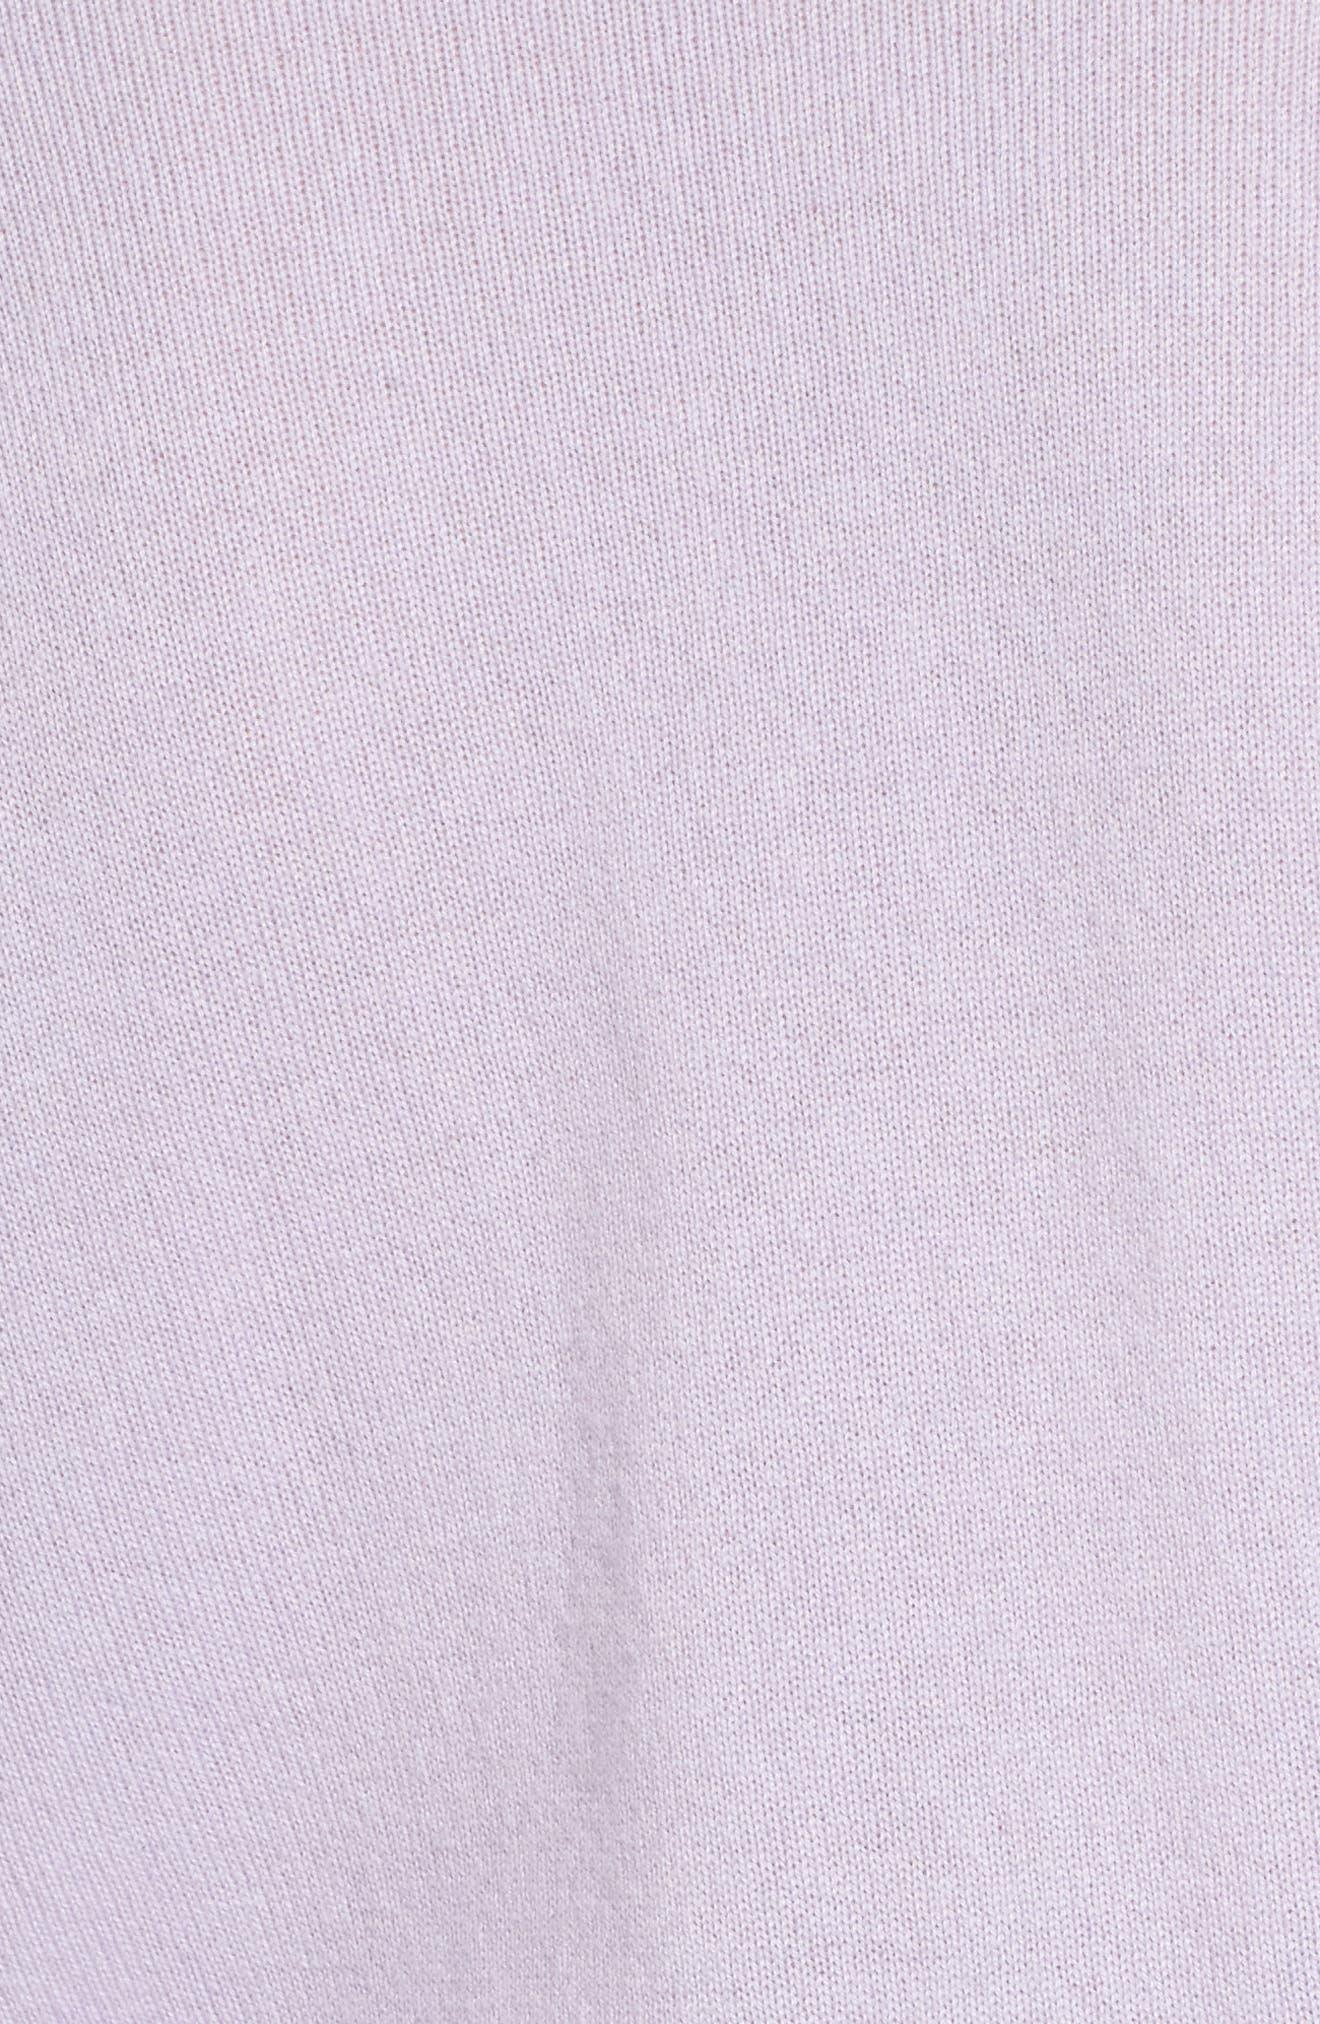 Ruffle Sleeve Cashmere Sweater,                             Alternate thumbnail 5, color,                             Purple Thistle